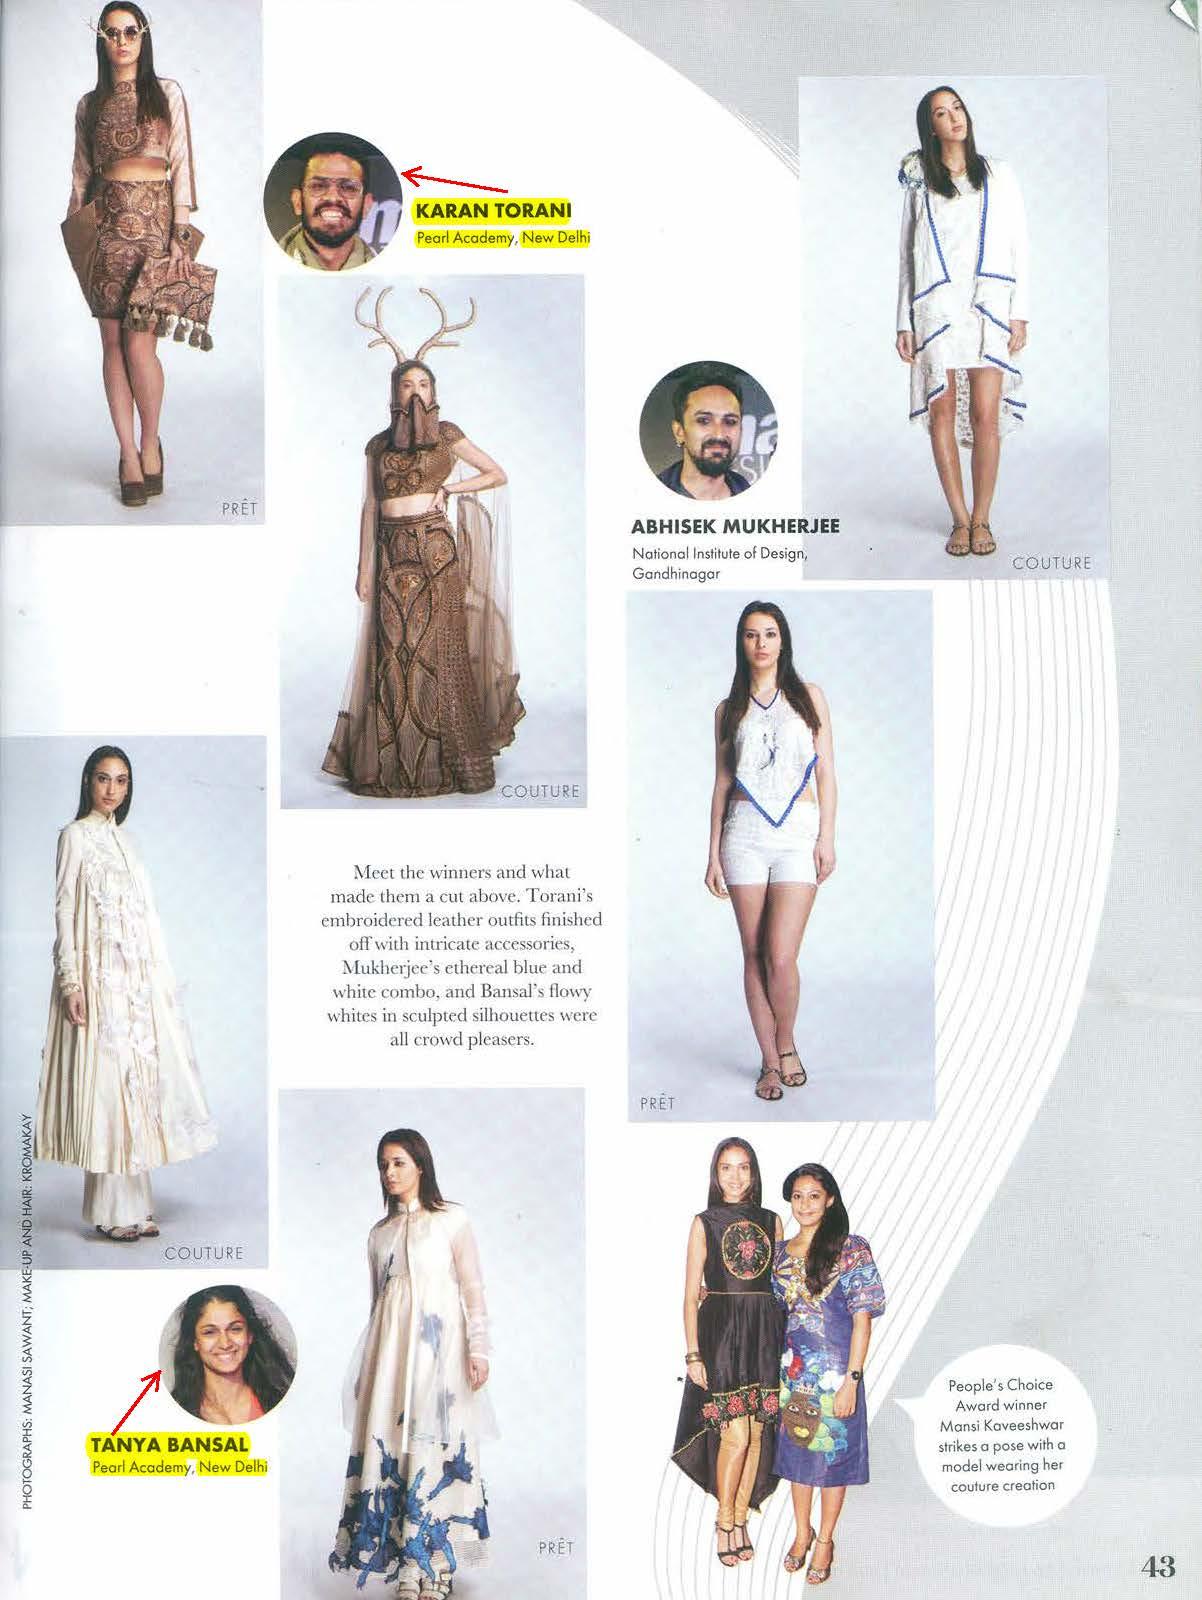 Tanya Bansal And Karan Torani Of Pearl Academy In Top 3 Winners At Max Design Awards 2014 Pearl Library Blog